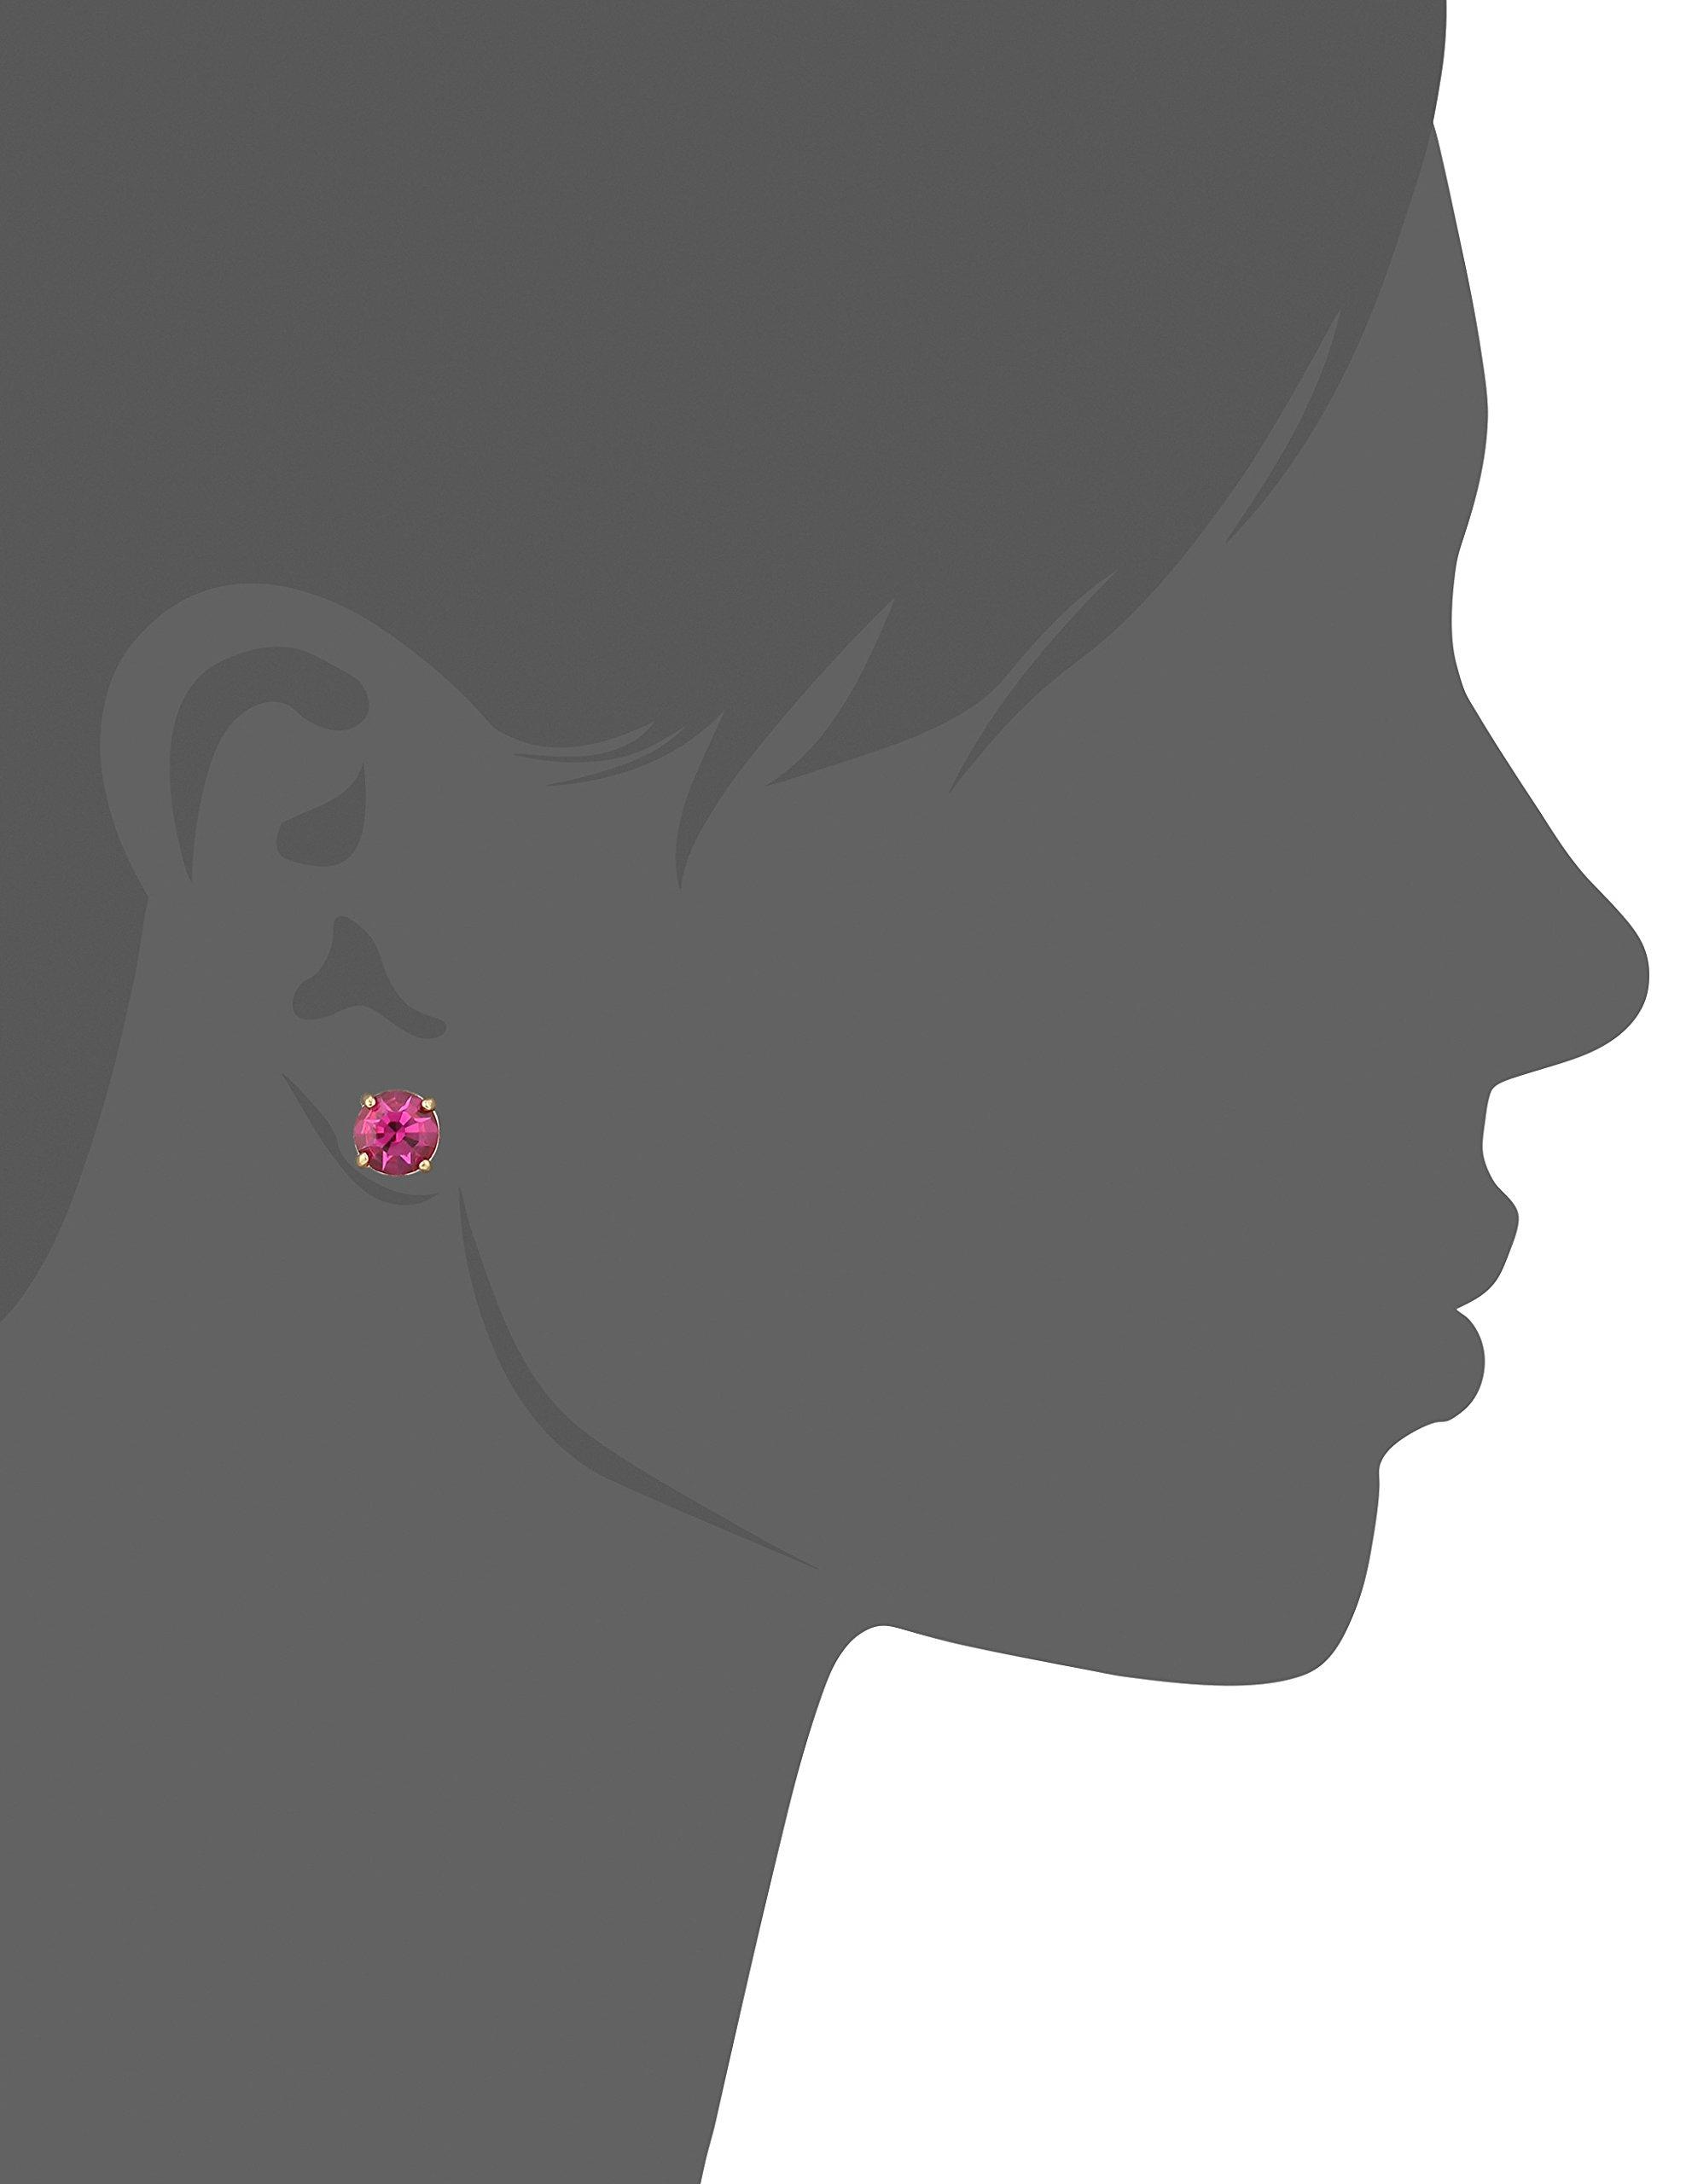 kate spade new york''Cueva Rosa'' Gold-Tone Pink Glass Stud Earrings by Kate Spade New York (Image #2)